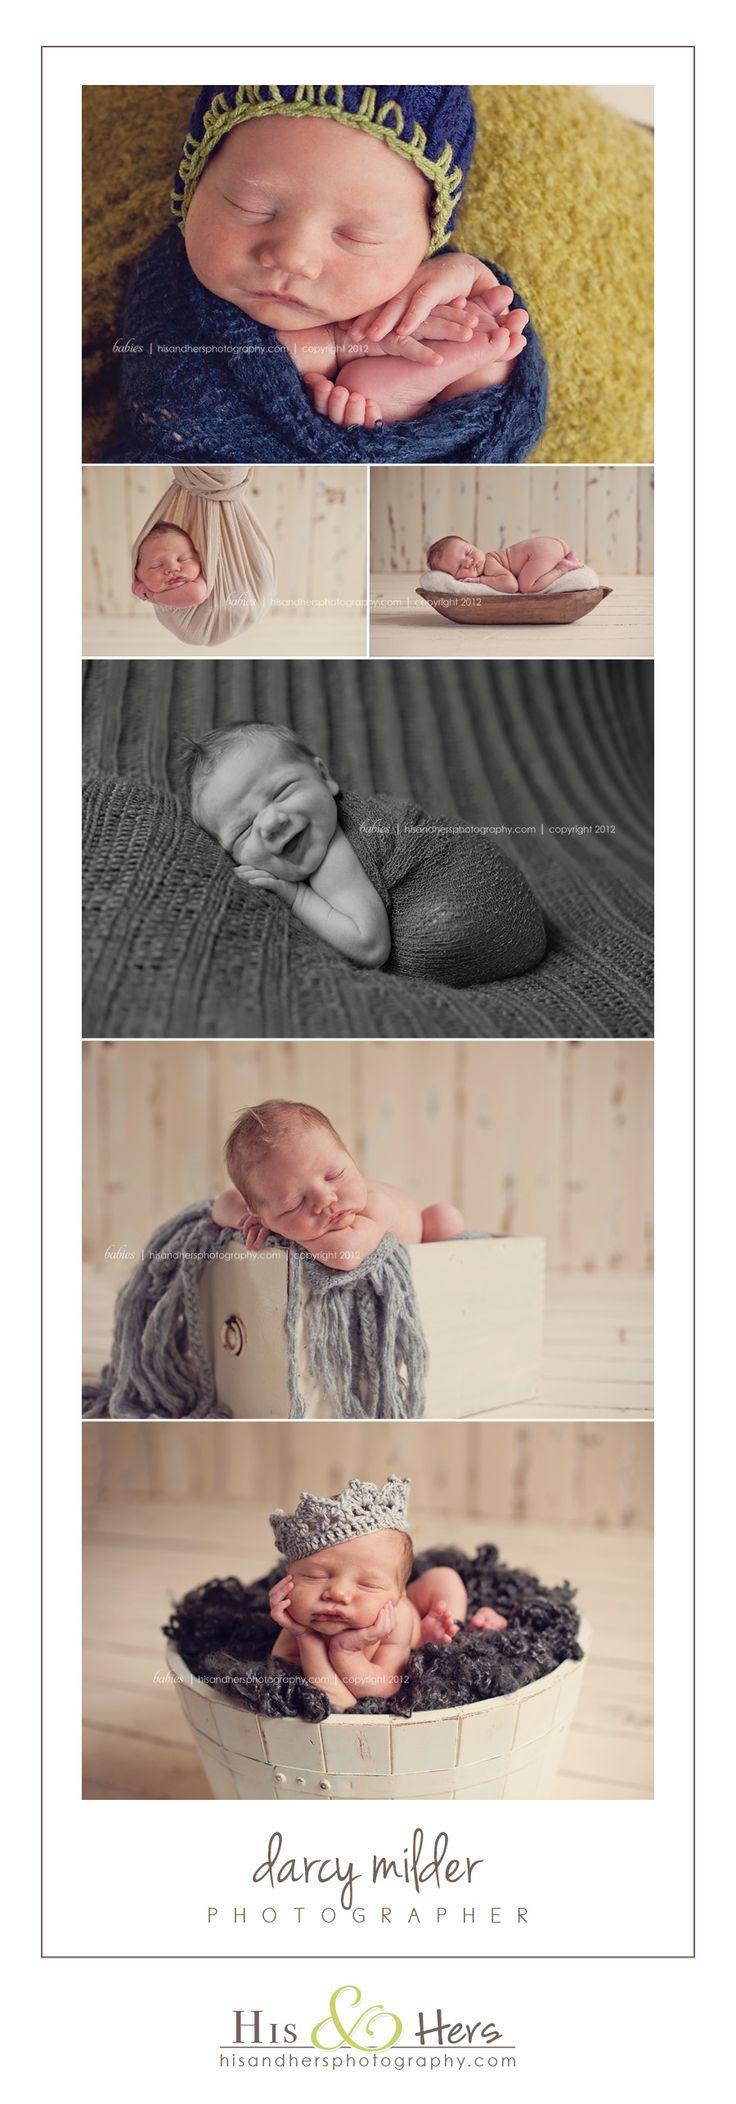 Iowa newborn photographer, Darcy Milder | His & Hers